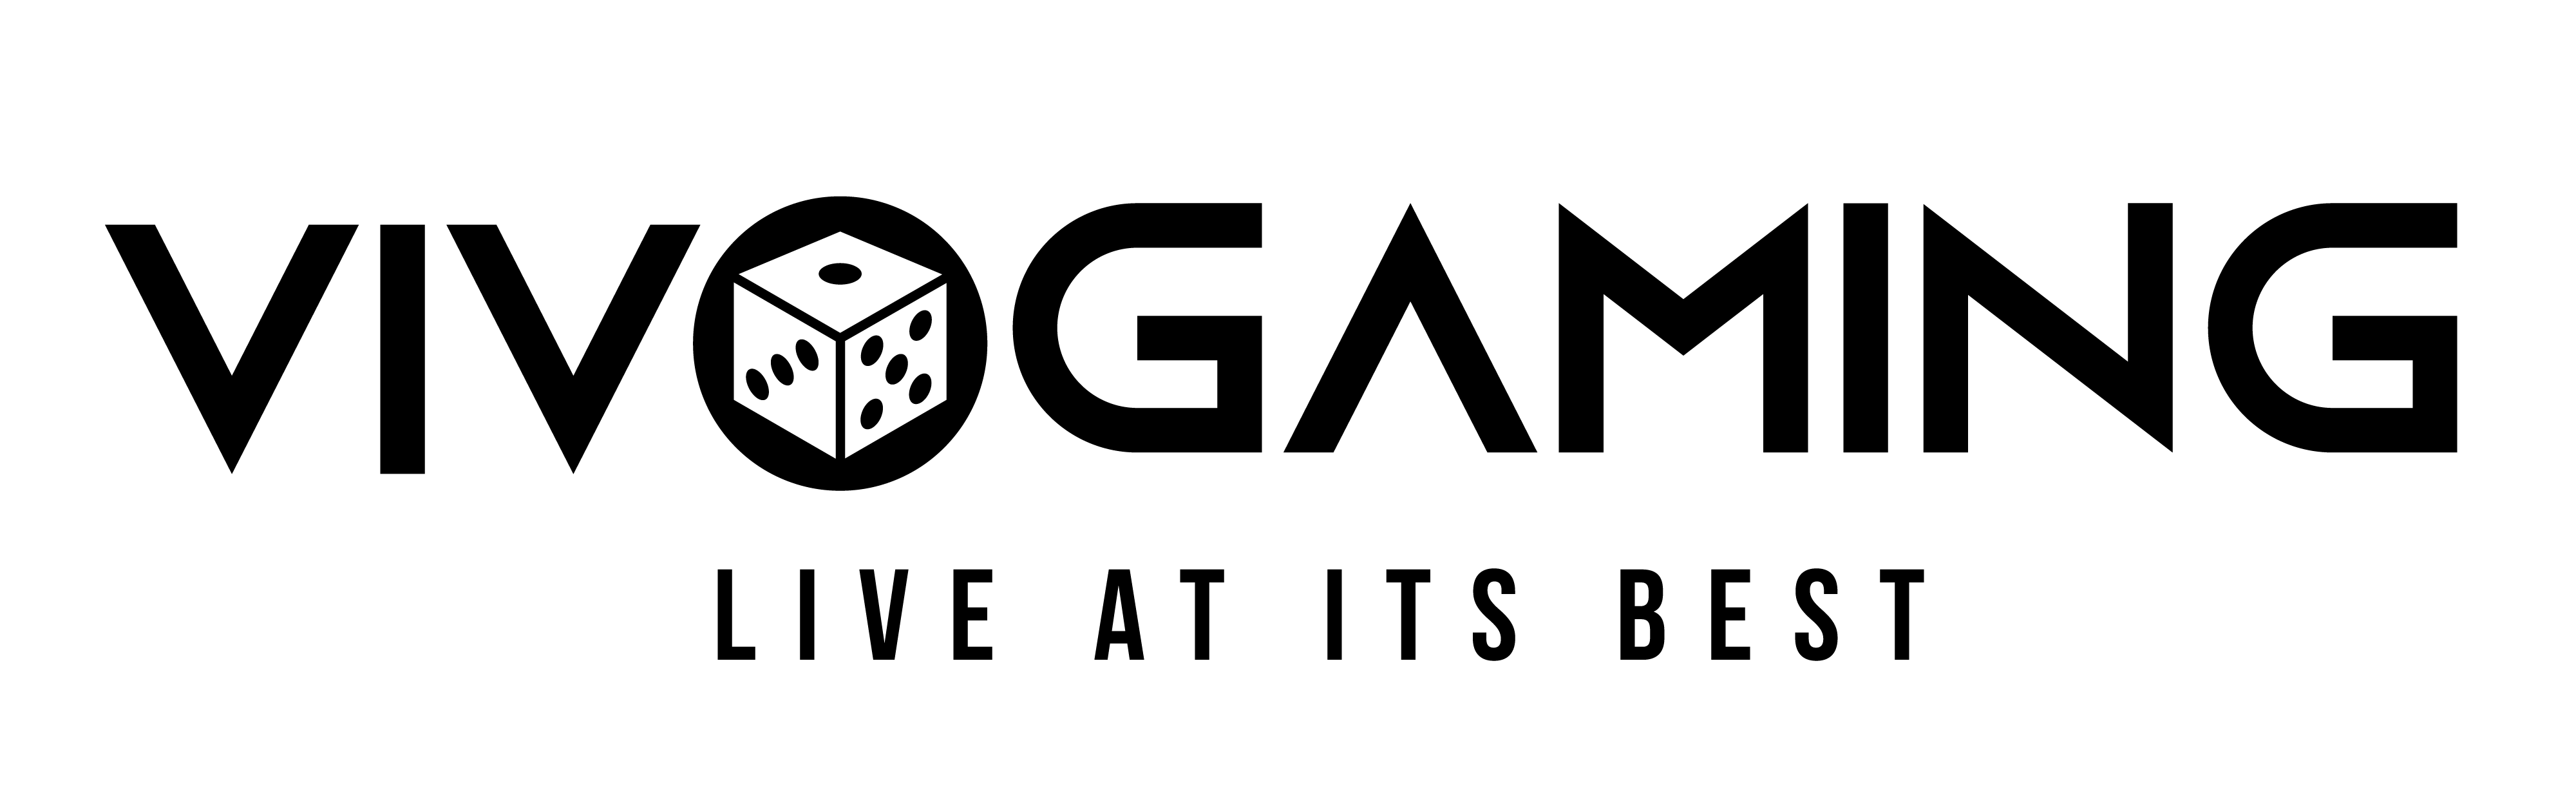 Vivo Gaming თამაშები